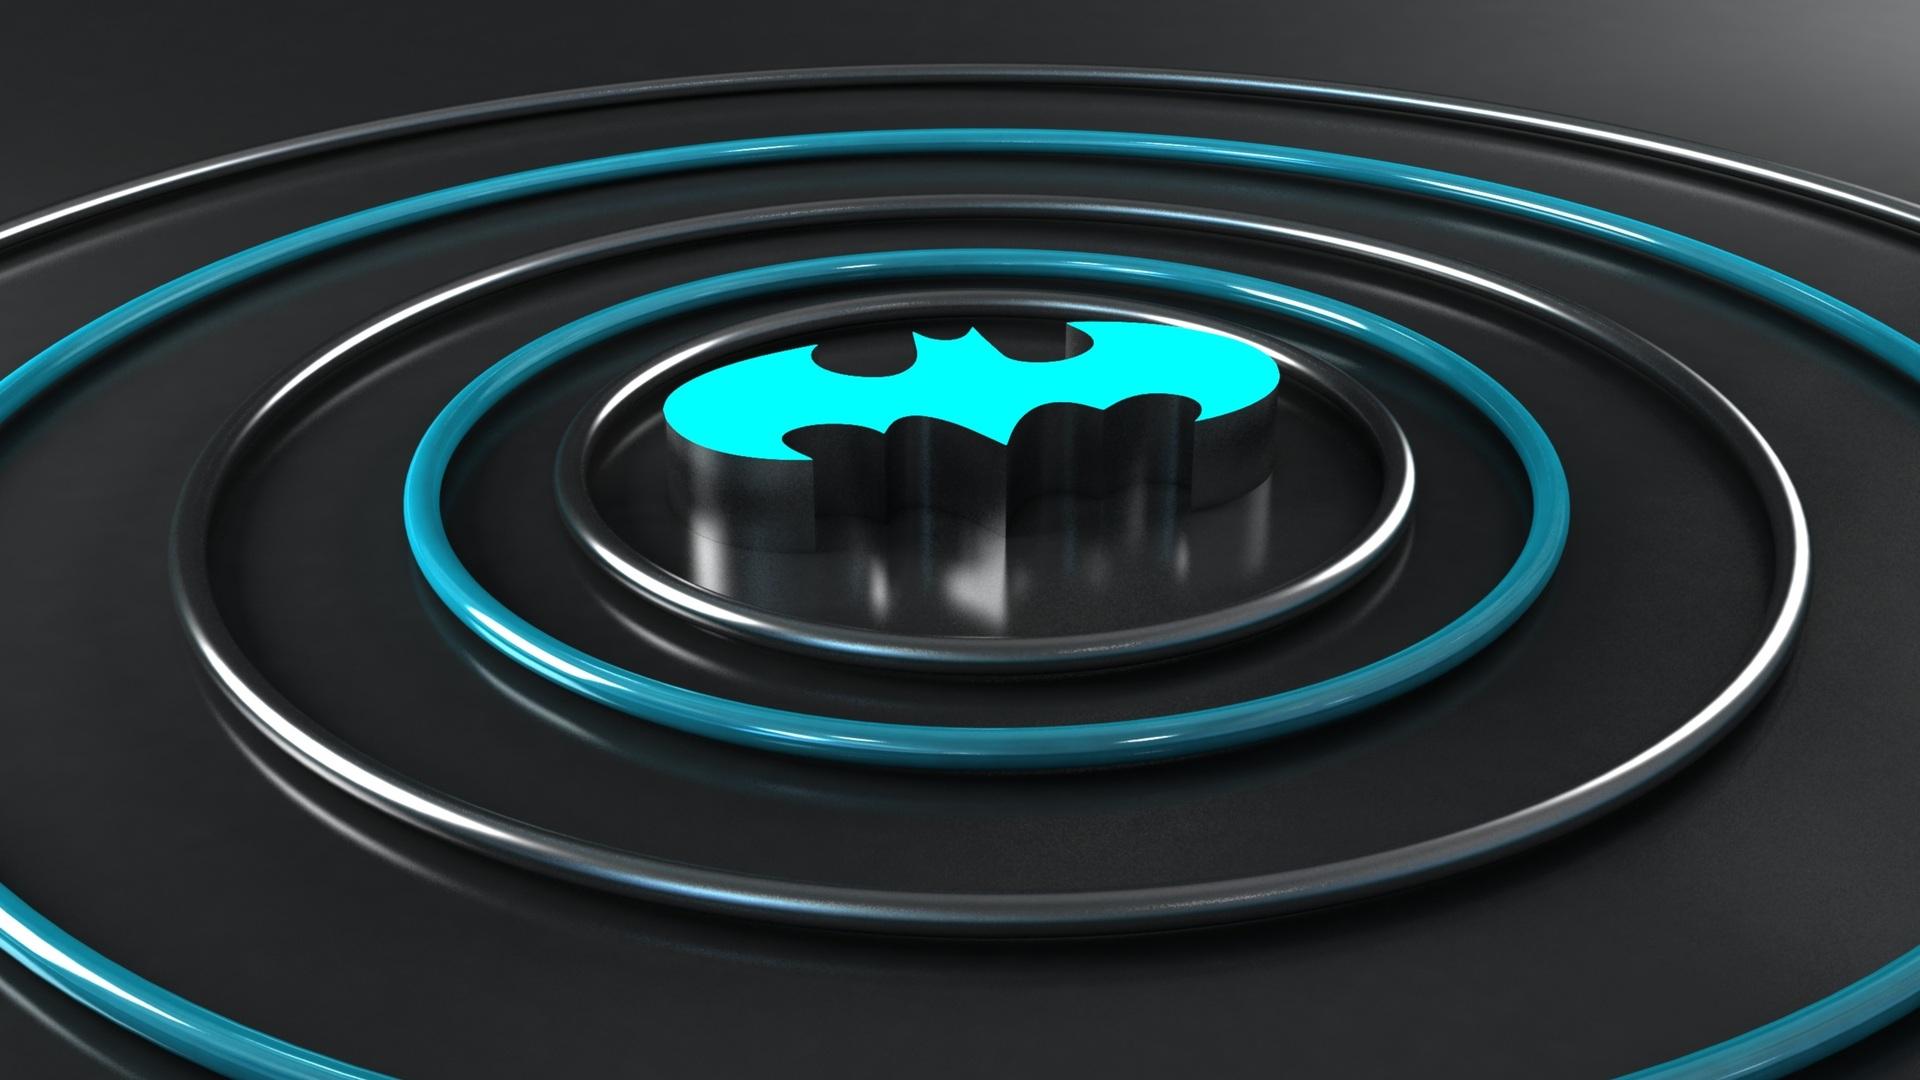 1920x1080 Batman Logo 3d Laptop Full Hd 1080p Hd 4k